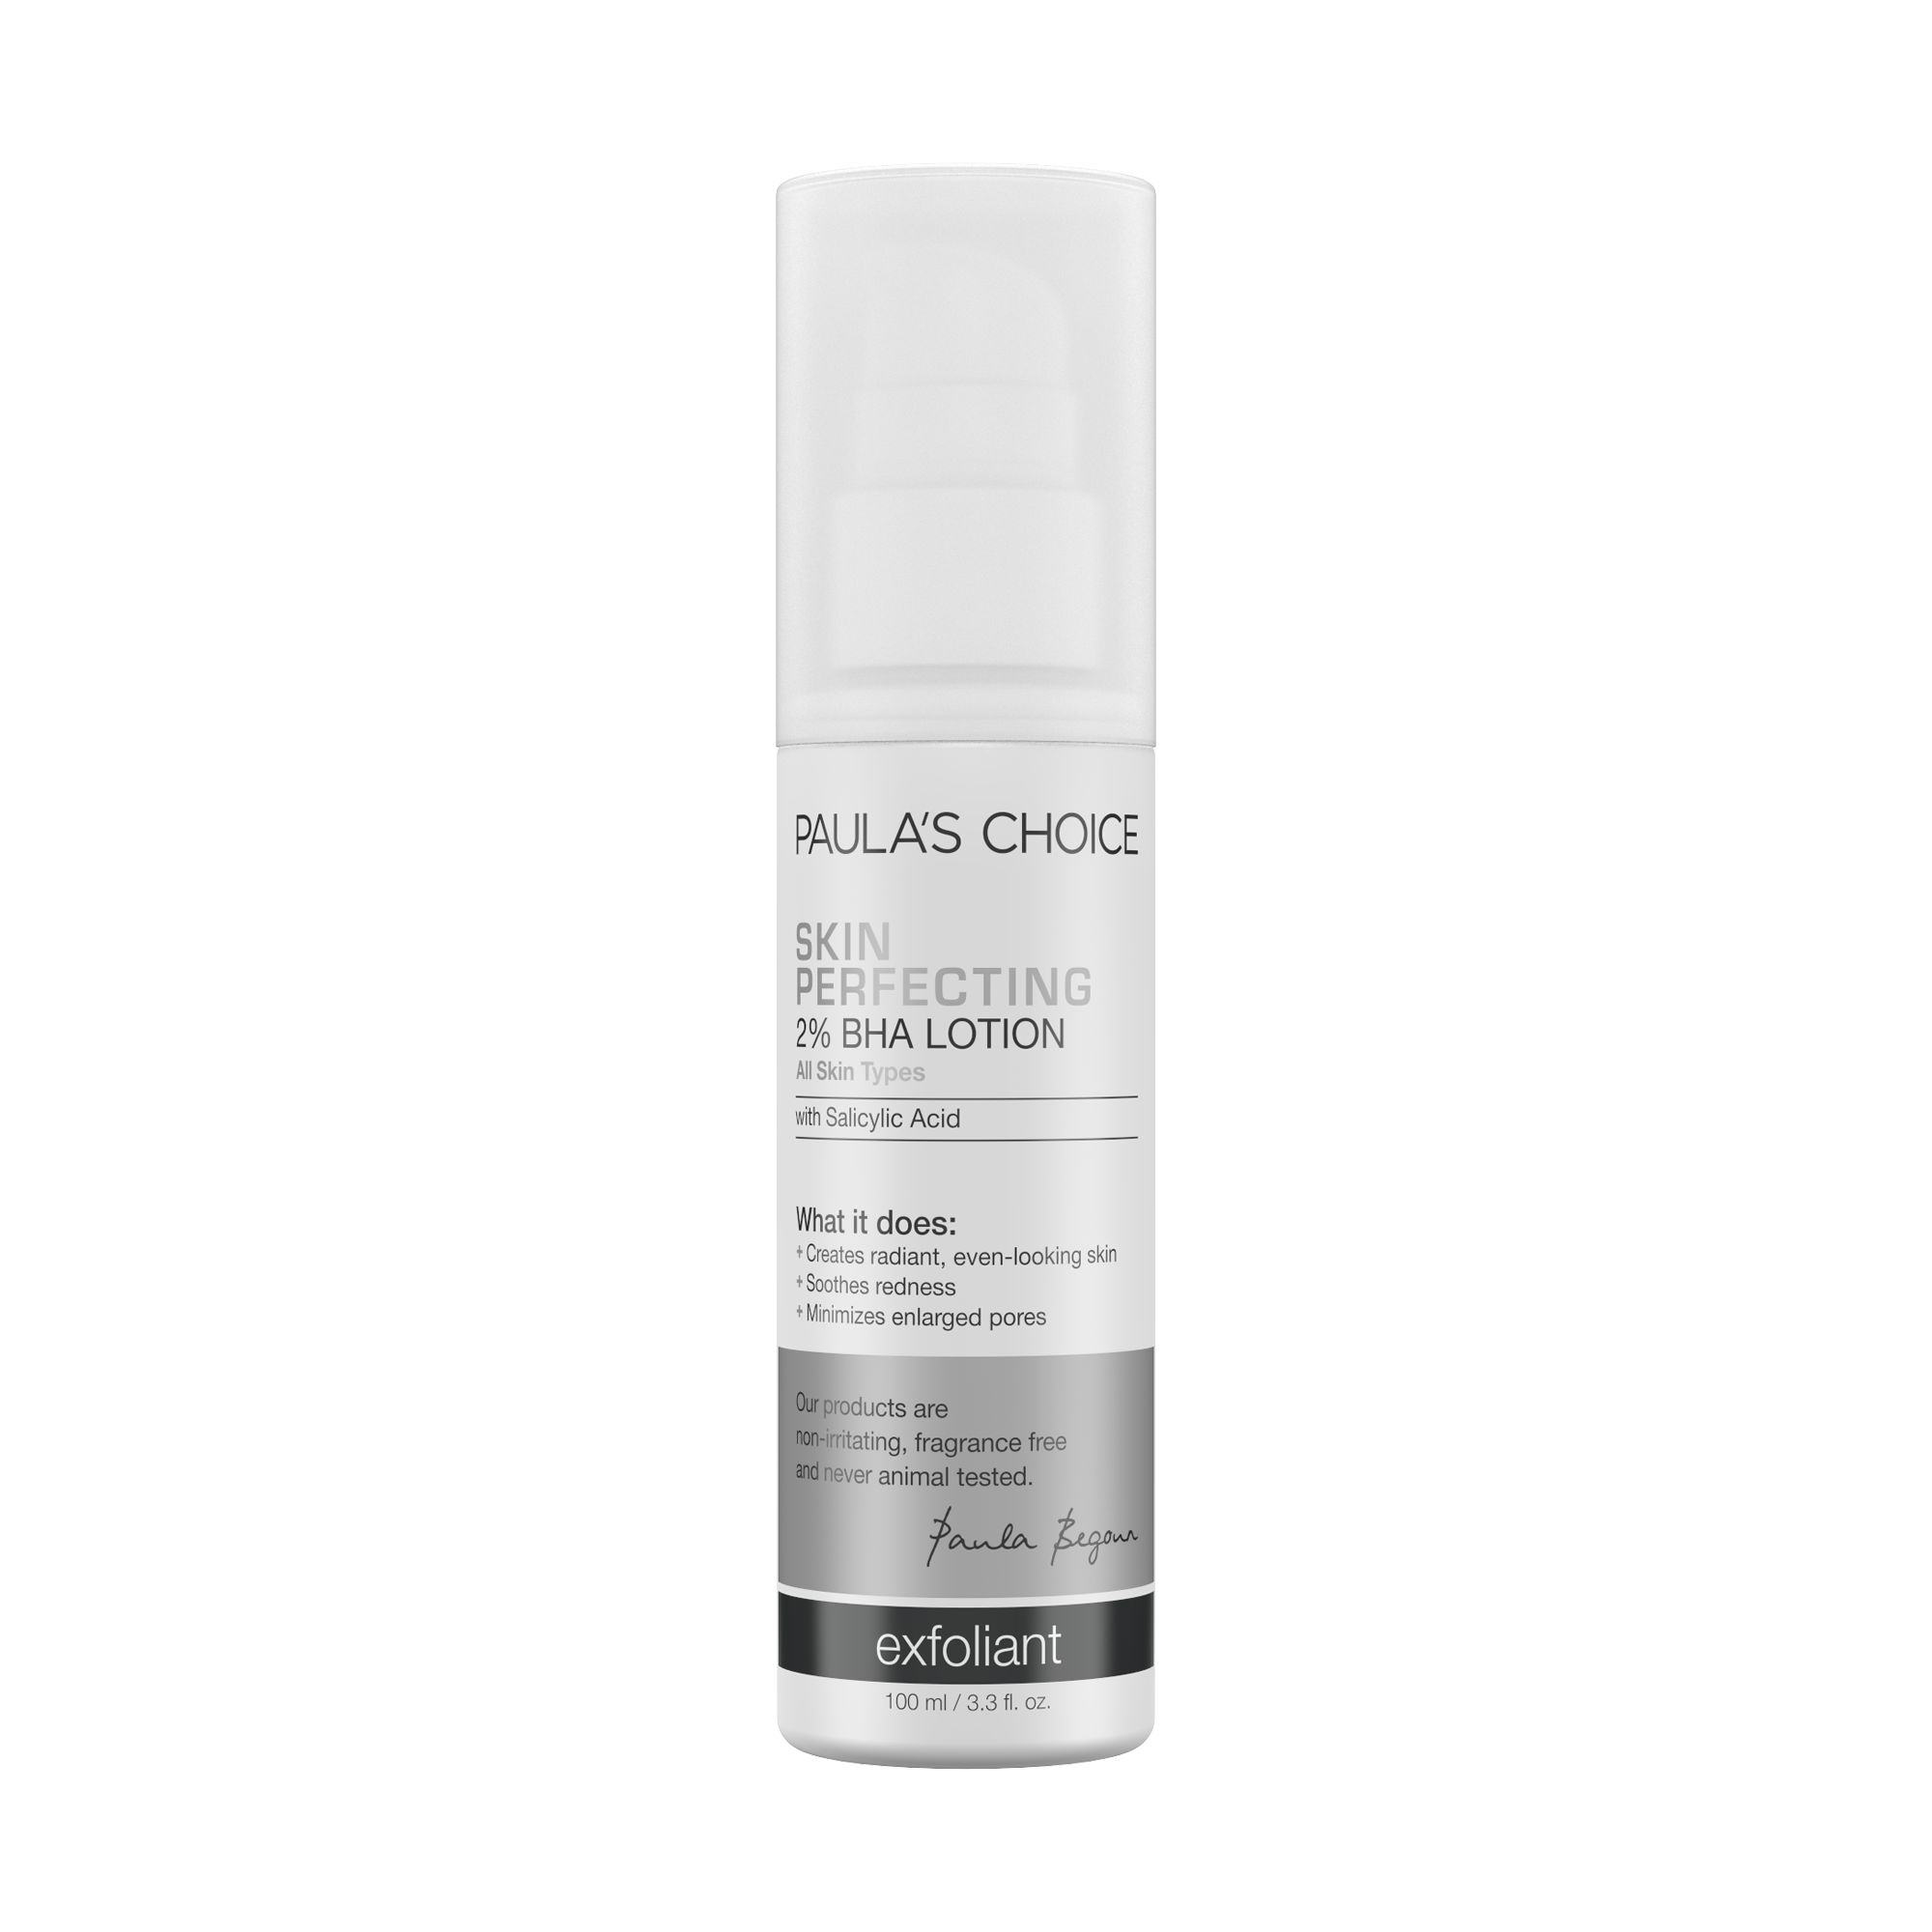 Paula's Choice Skin Perfecting 2% BHA Liquid – Leave on exfoliant, € 33,00